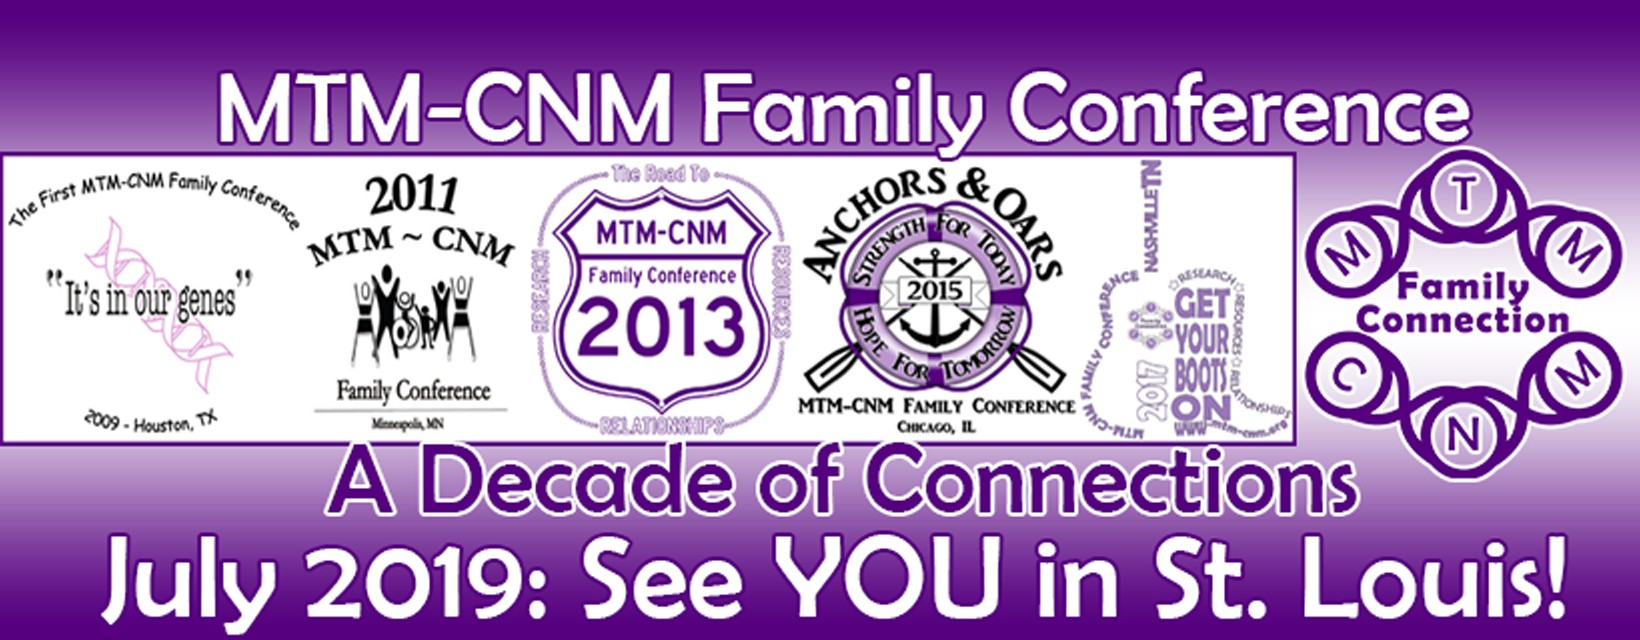 MTM-CNM Family Connection, Inc   LinkedIn